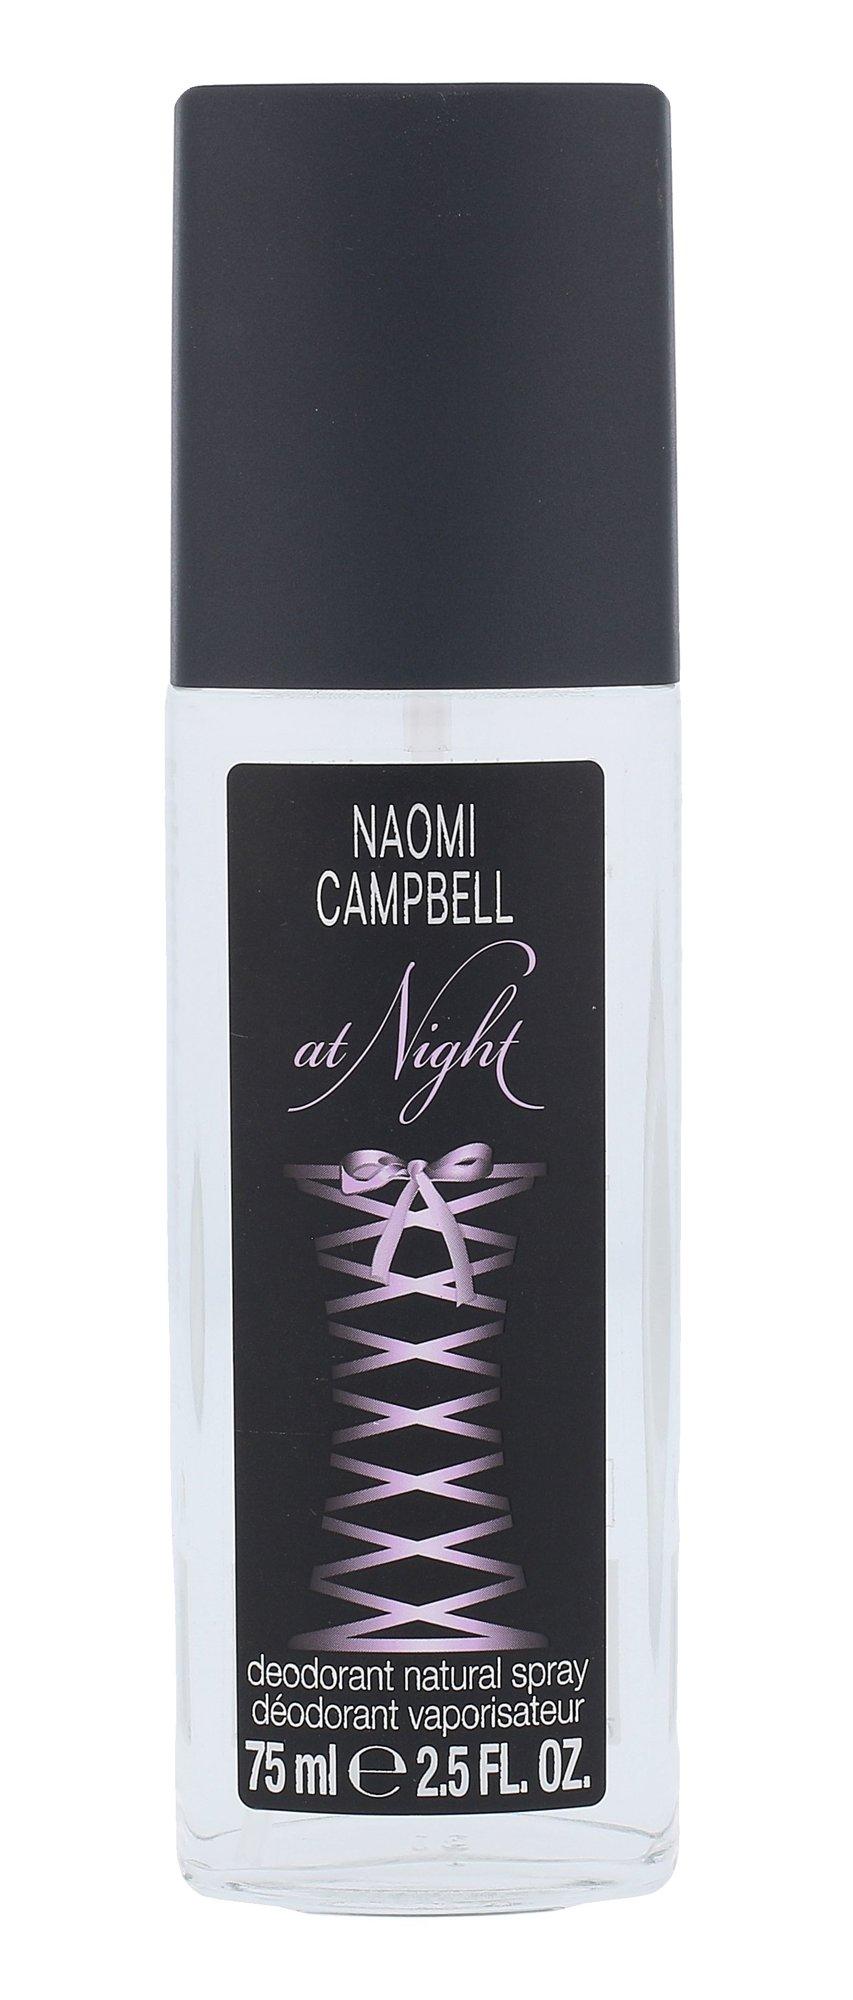 Naomi Campbell Naomi Campbell At Night Deodorant 75ml